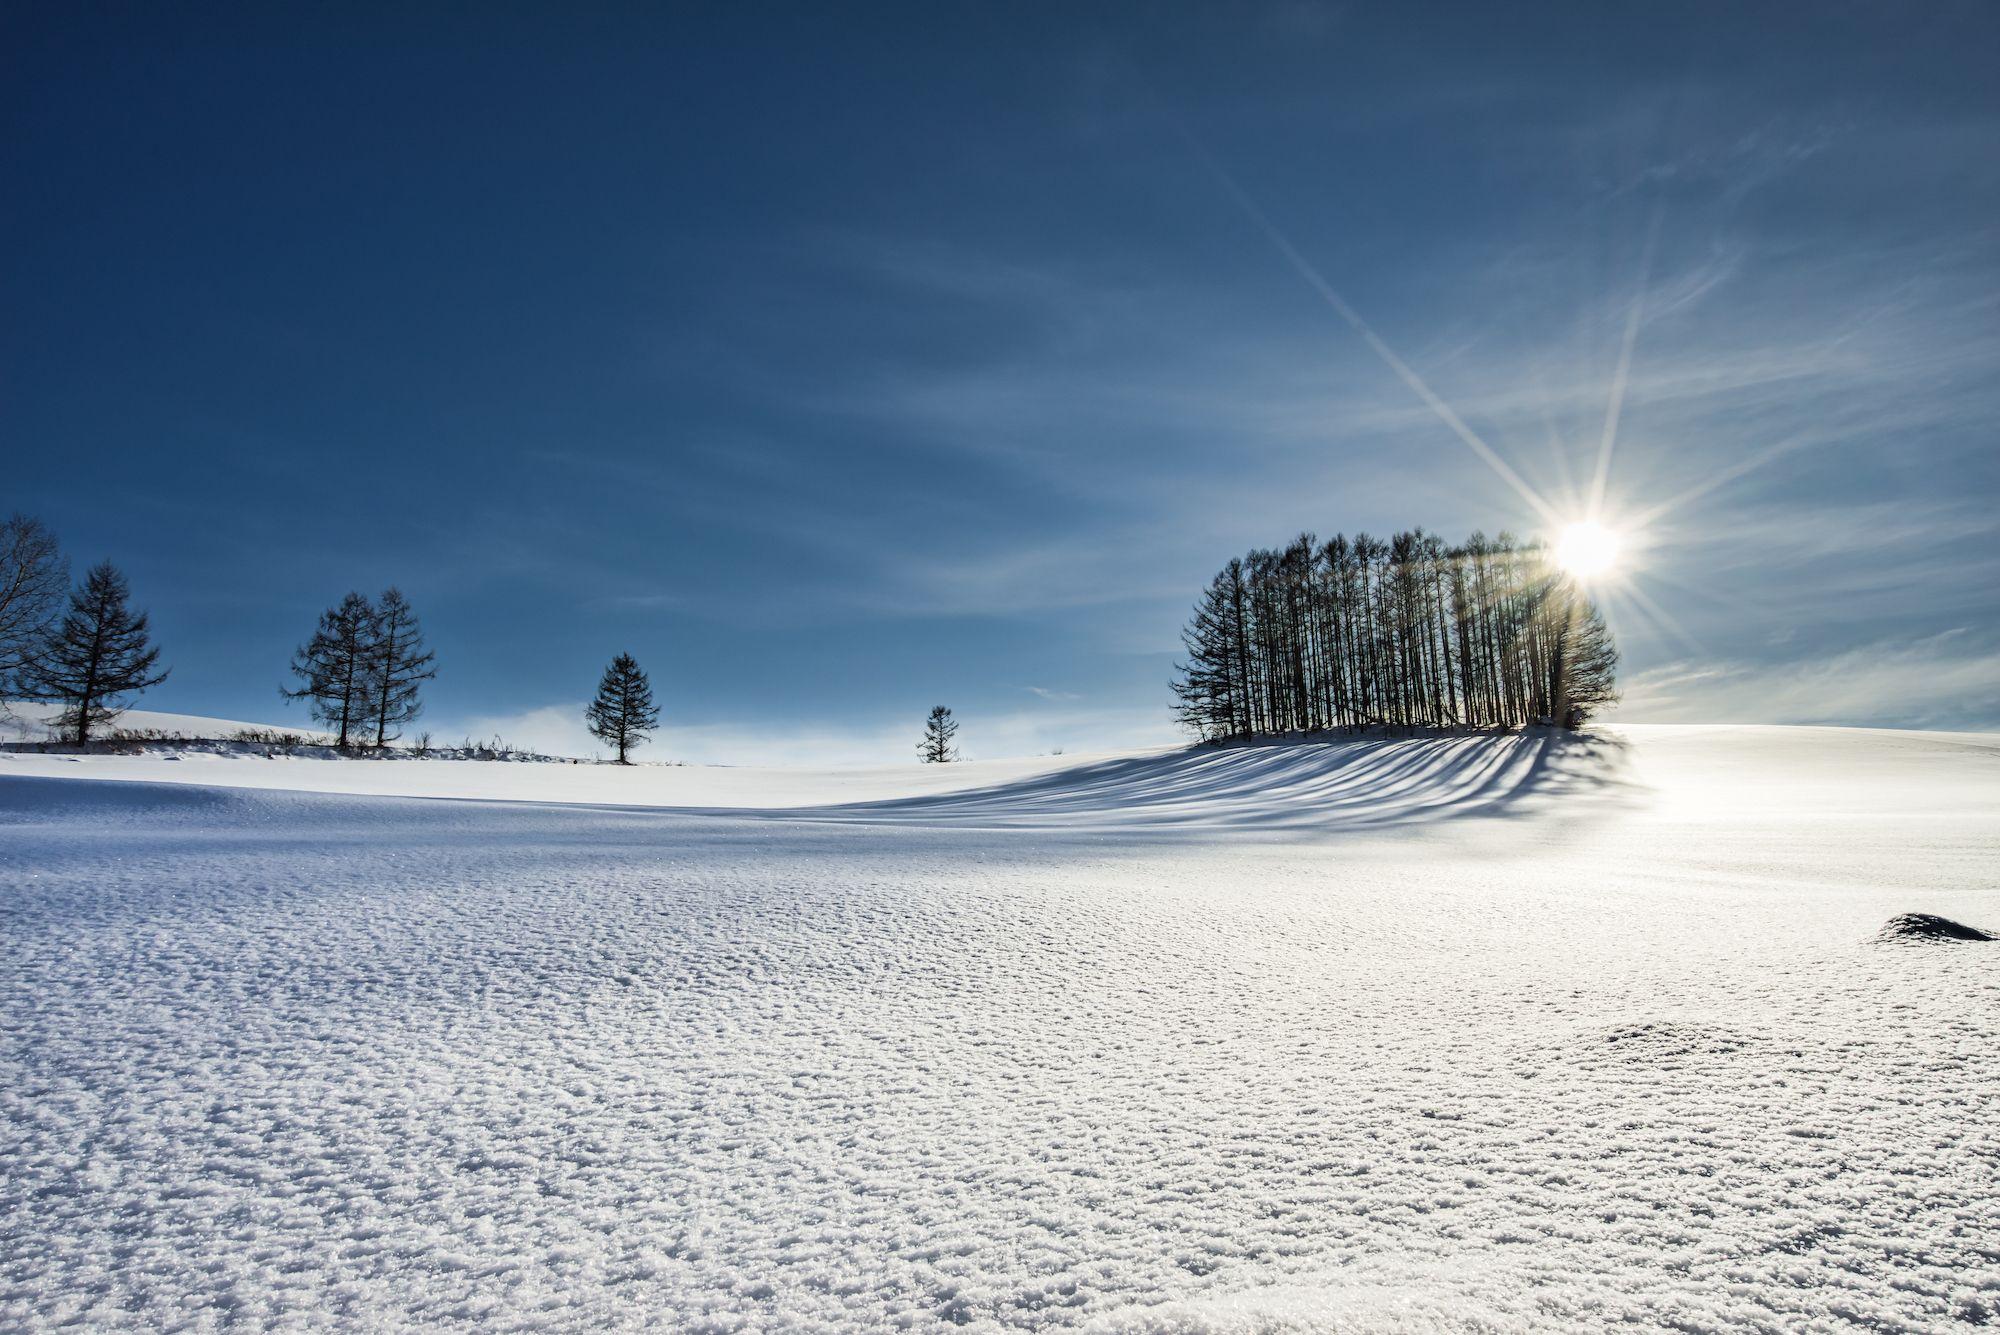 This photo taken by Masa. . . . . . #PASHADELIC #絶景delic . #日本の絶景 #北海道 #hokkaido #マイルドセブンの丘 #biei #snow . . #sony #ilce7r #beautifulview #igers #ig_japan #instagood #instajapan #japan #japan_daytime_view #japantravel #japantrip #landscape #nature #natureshots #nature_shooters #naturephotography #photooftheday #photography #photo_jpn #photo_travelers